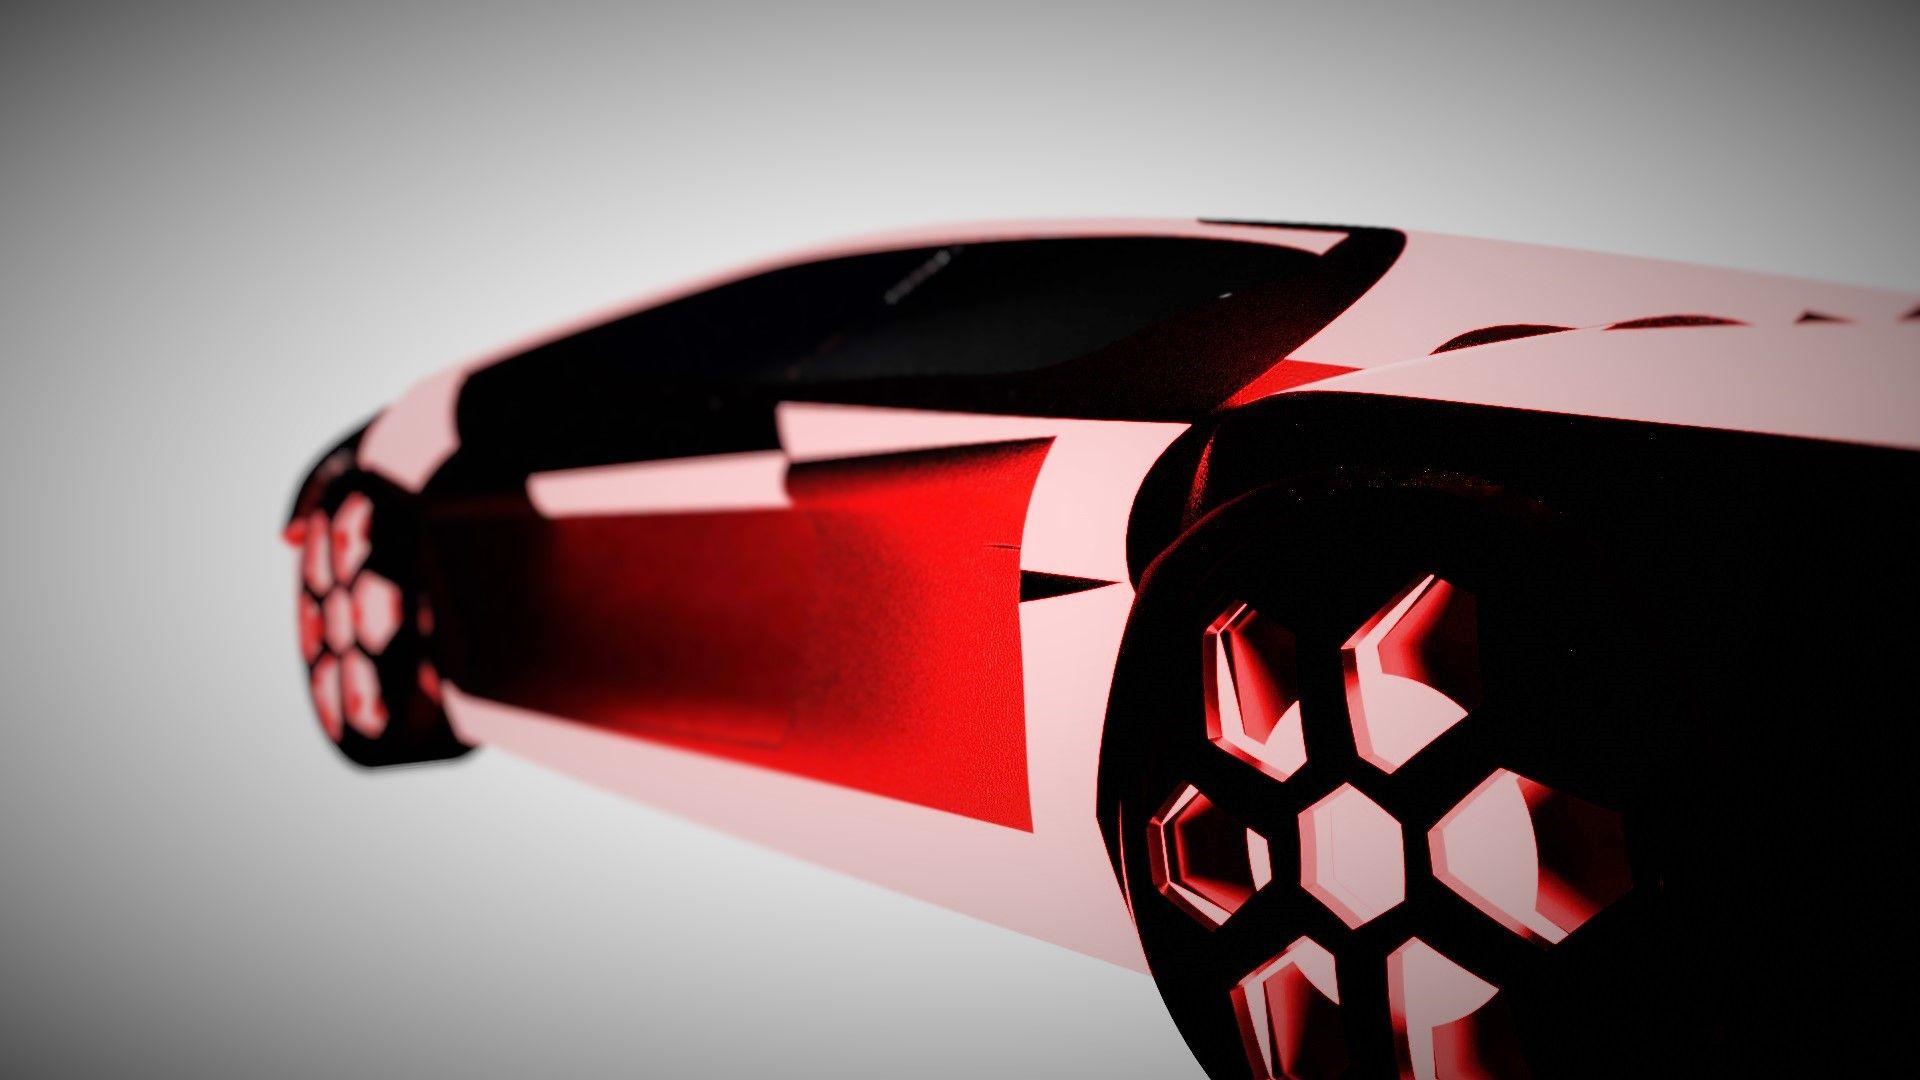 Lamborghini-2016-aug-21-12-10-01pm-000-customizedview22921769162-6-3500-3500